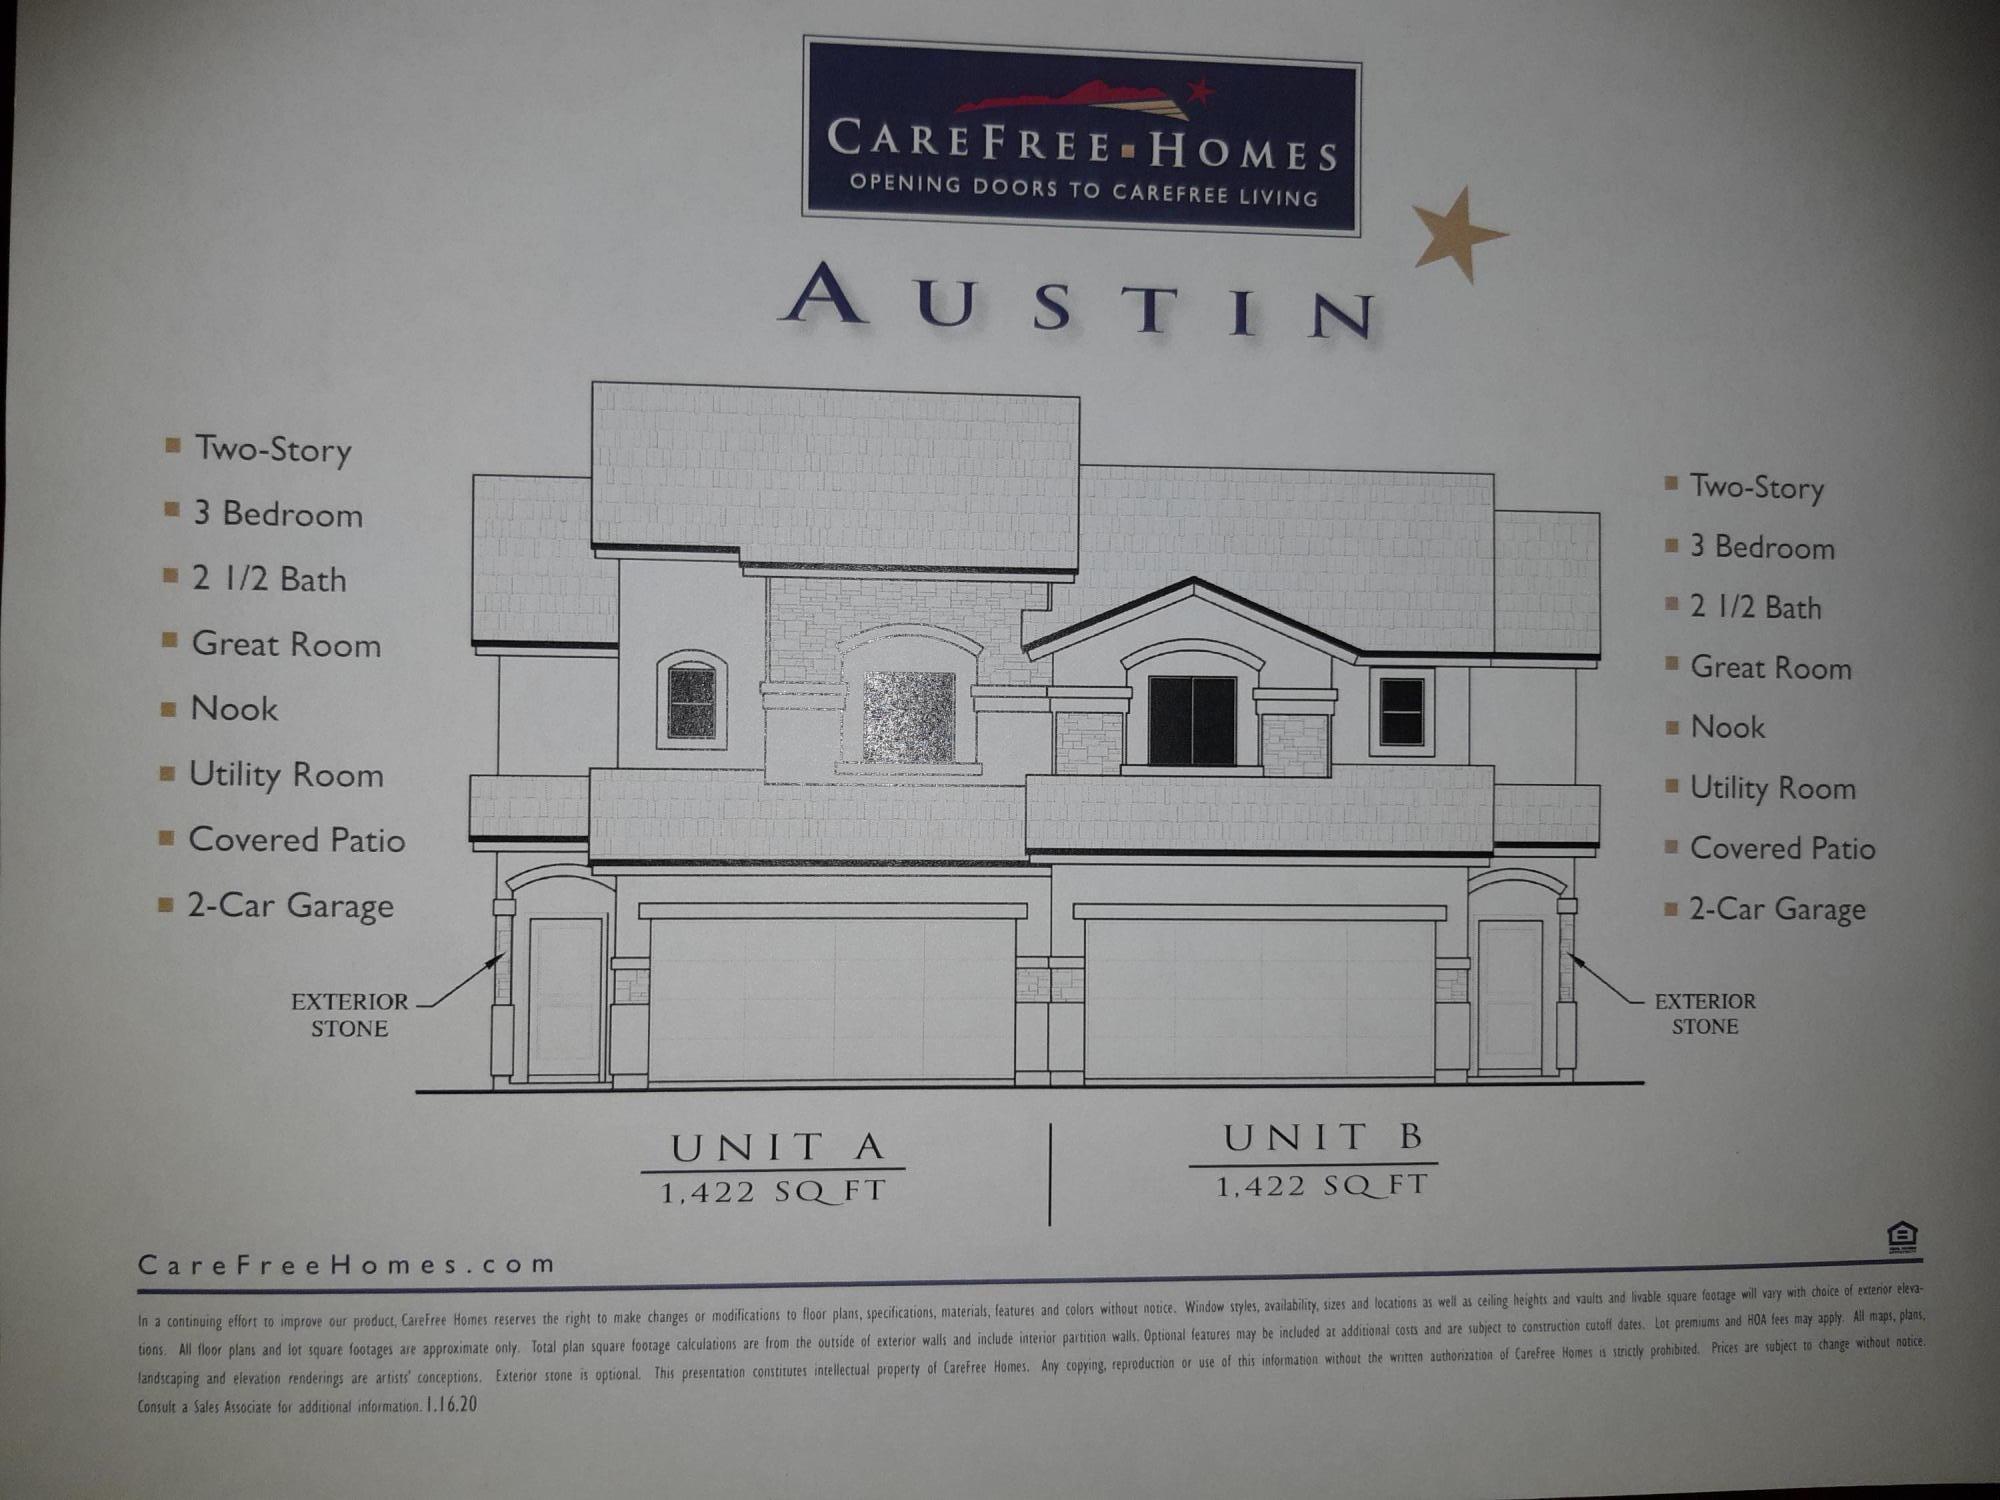 513 Dusk View, Socorro, Texas 79927, 3 Bedrooms Bedrooms, ,2 BathroomsBathrooms,Residential,For sale,Dusk View,823570